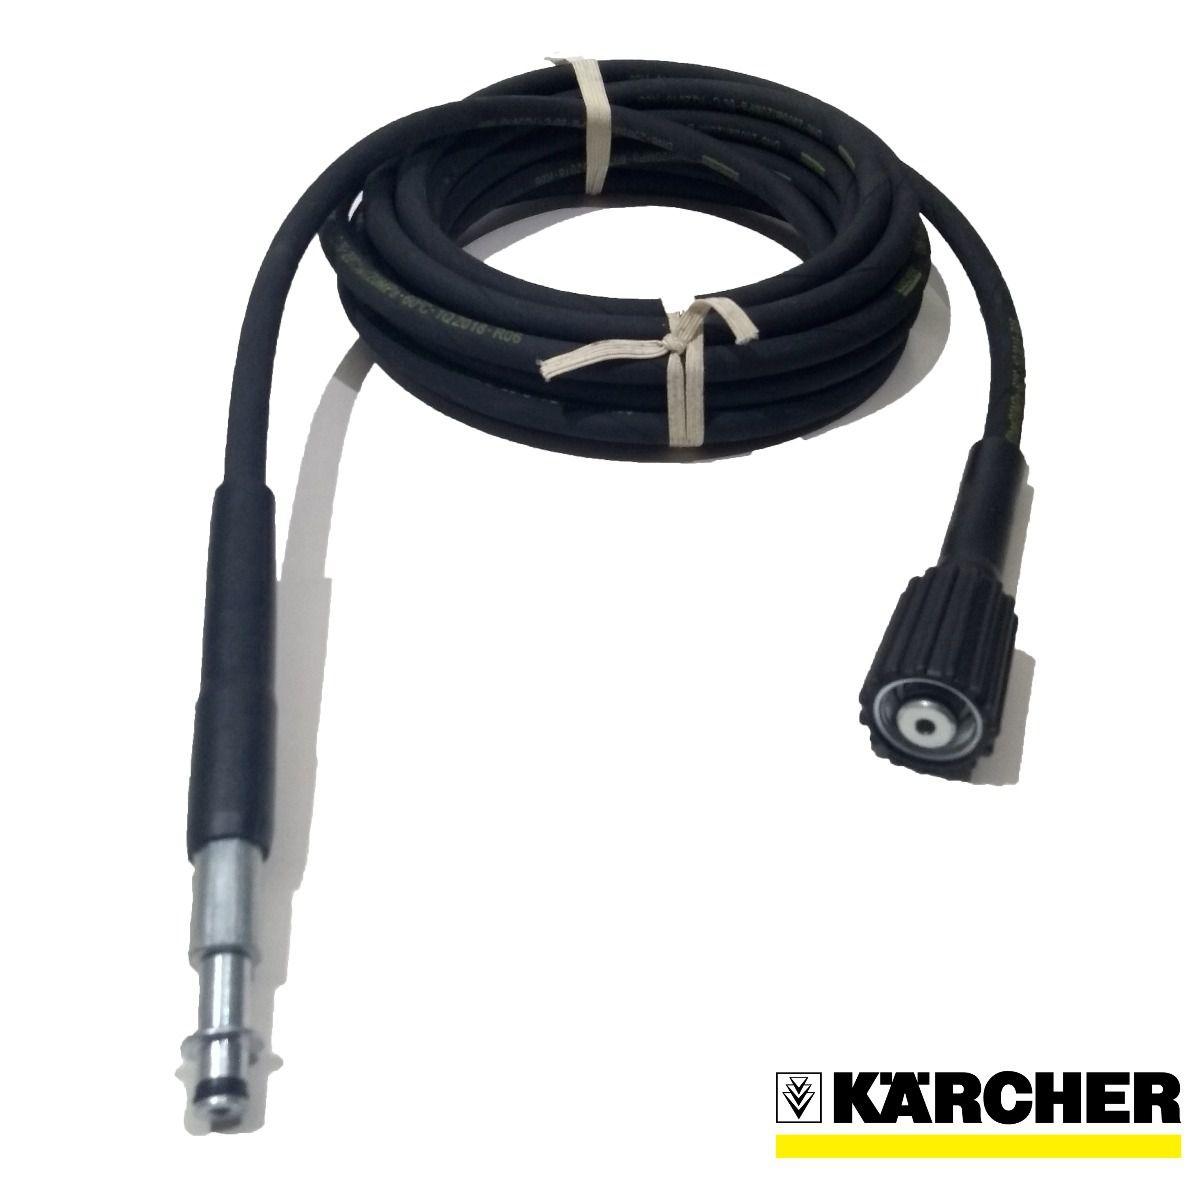 Mangueira Lavadora Karcher HD 585 Trama Aço 7,5m  - HL SERVICE